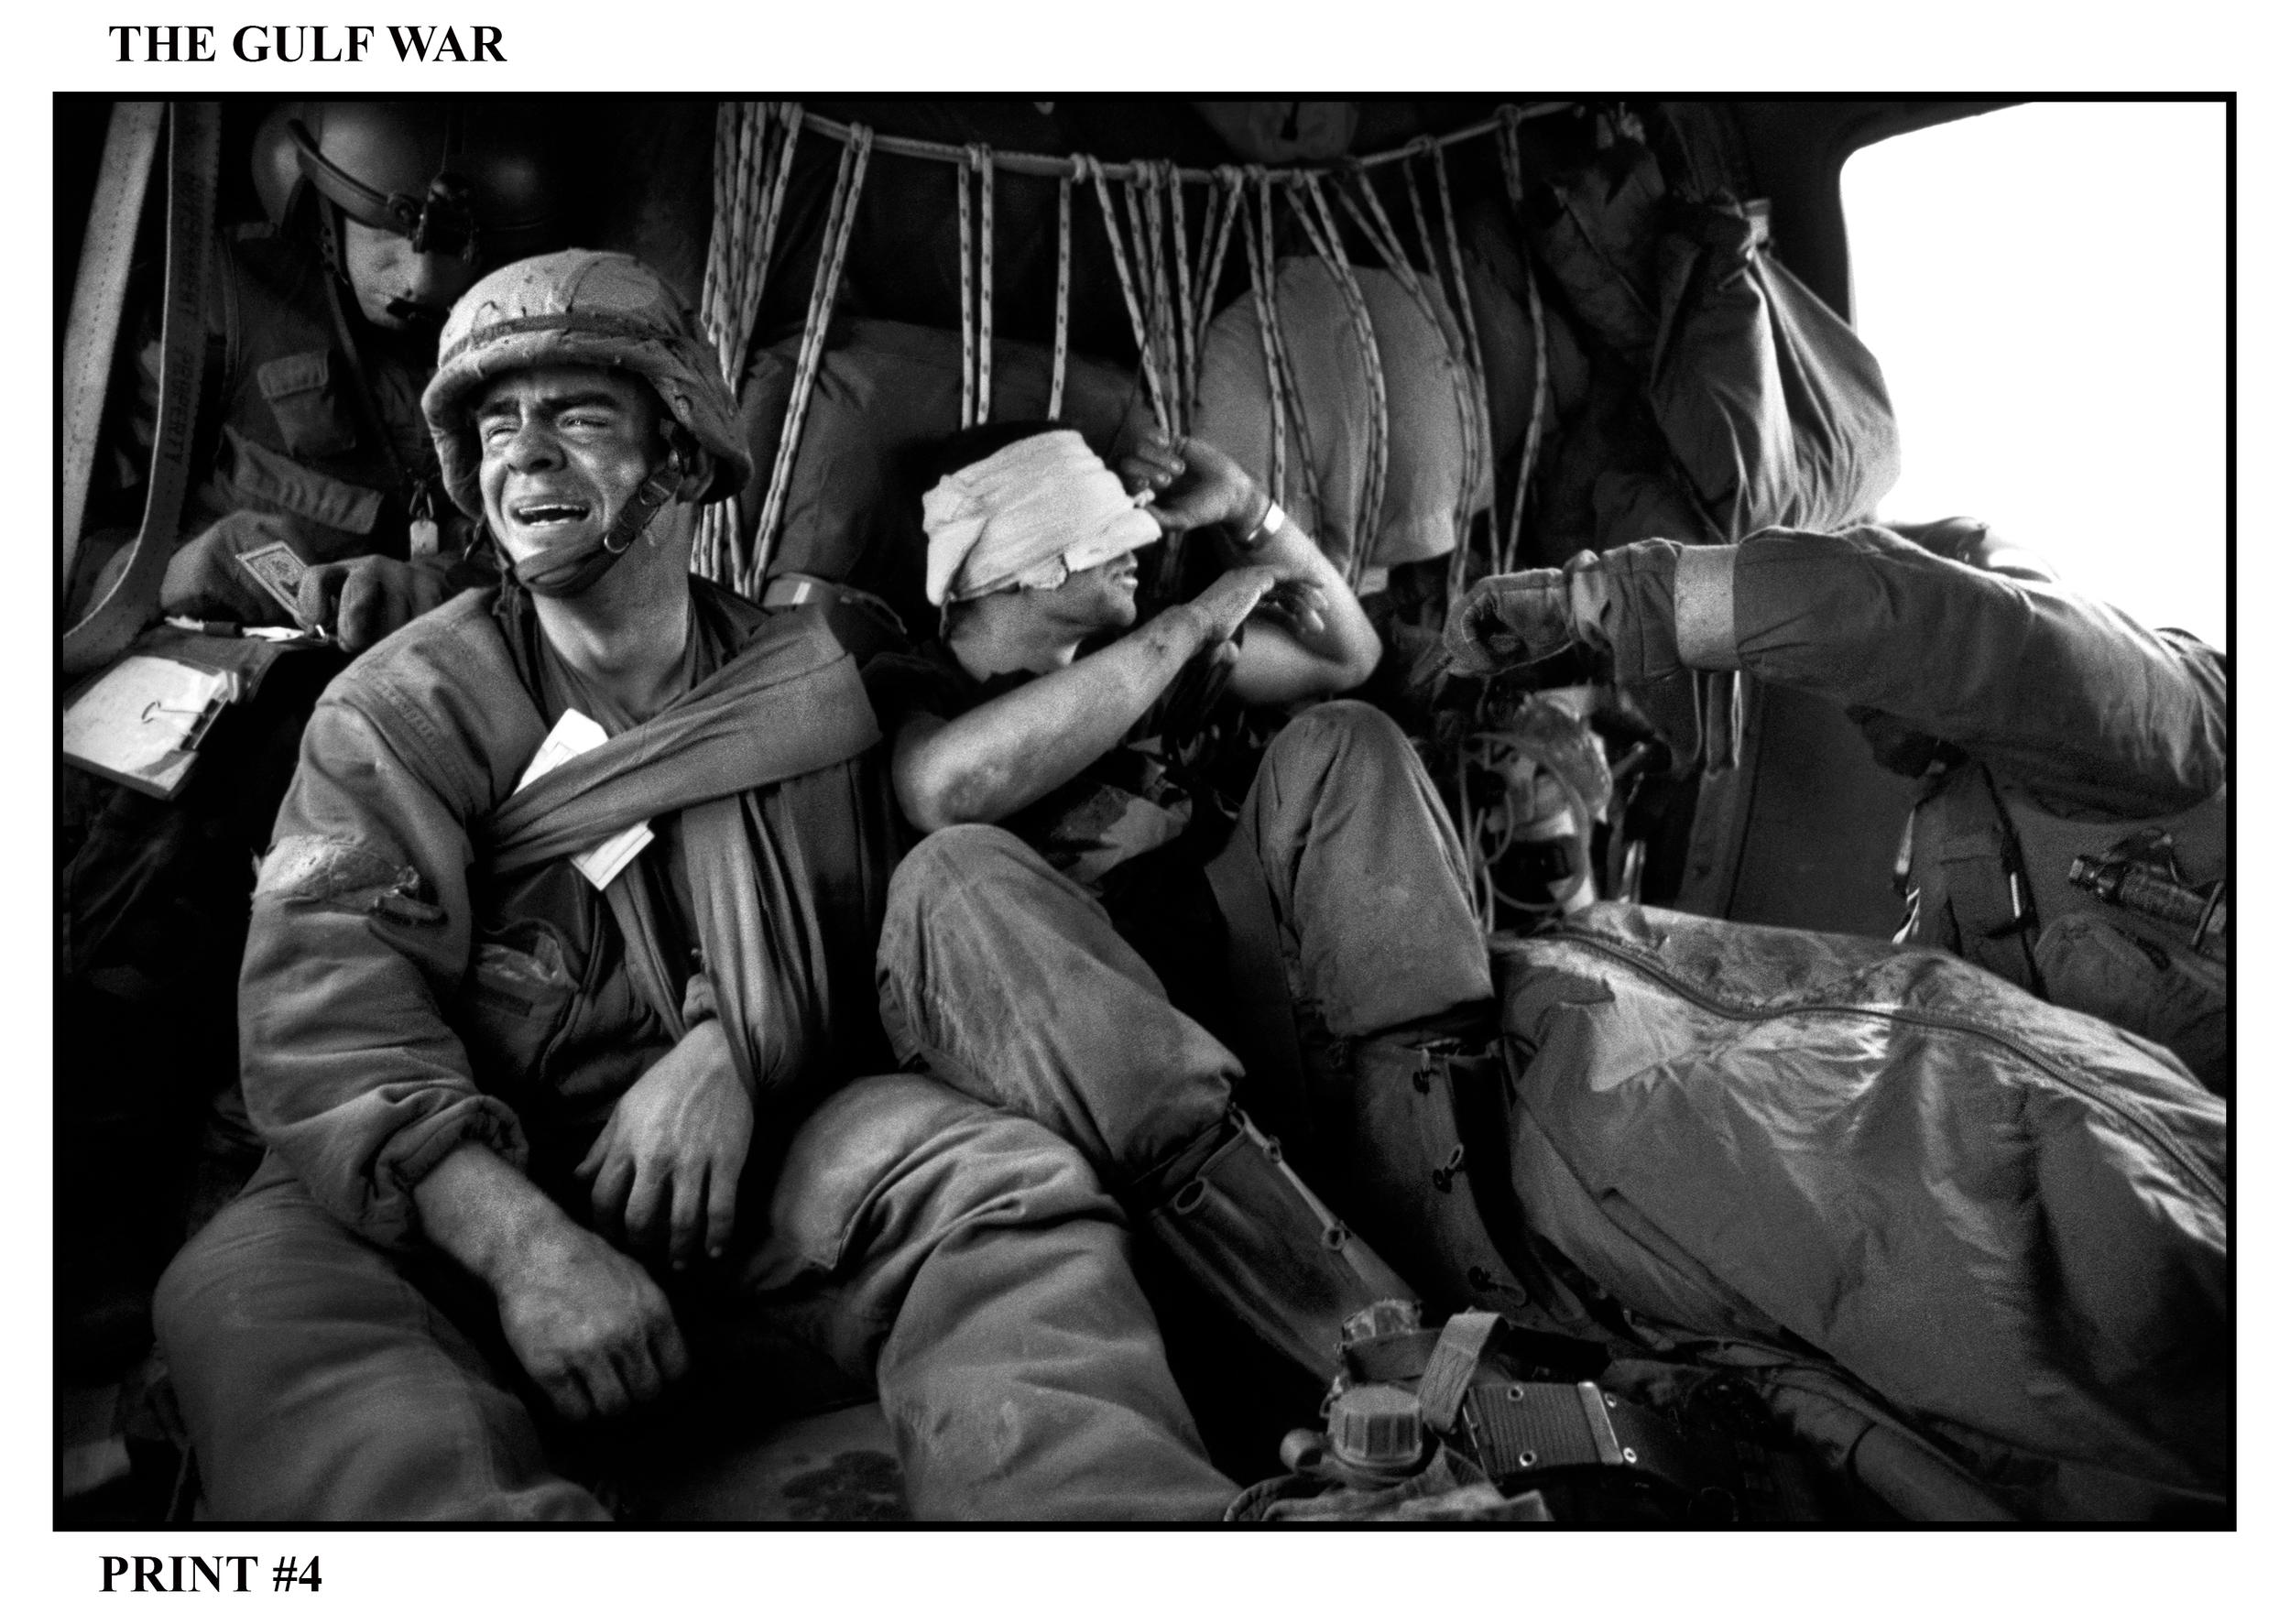 004THE GULF WAR copy.jpg